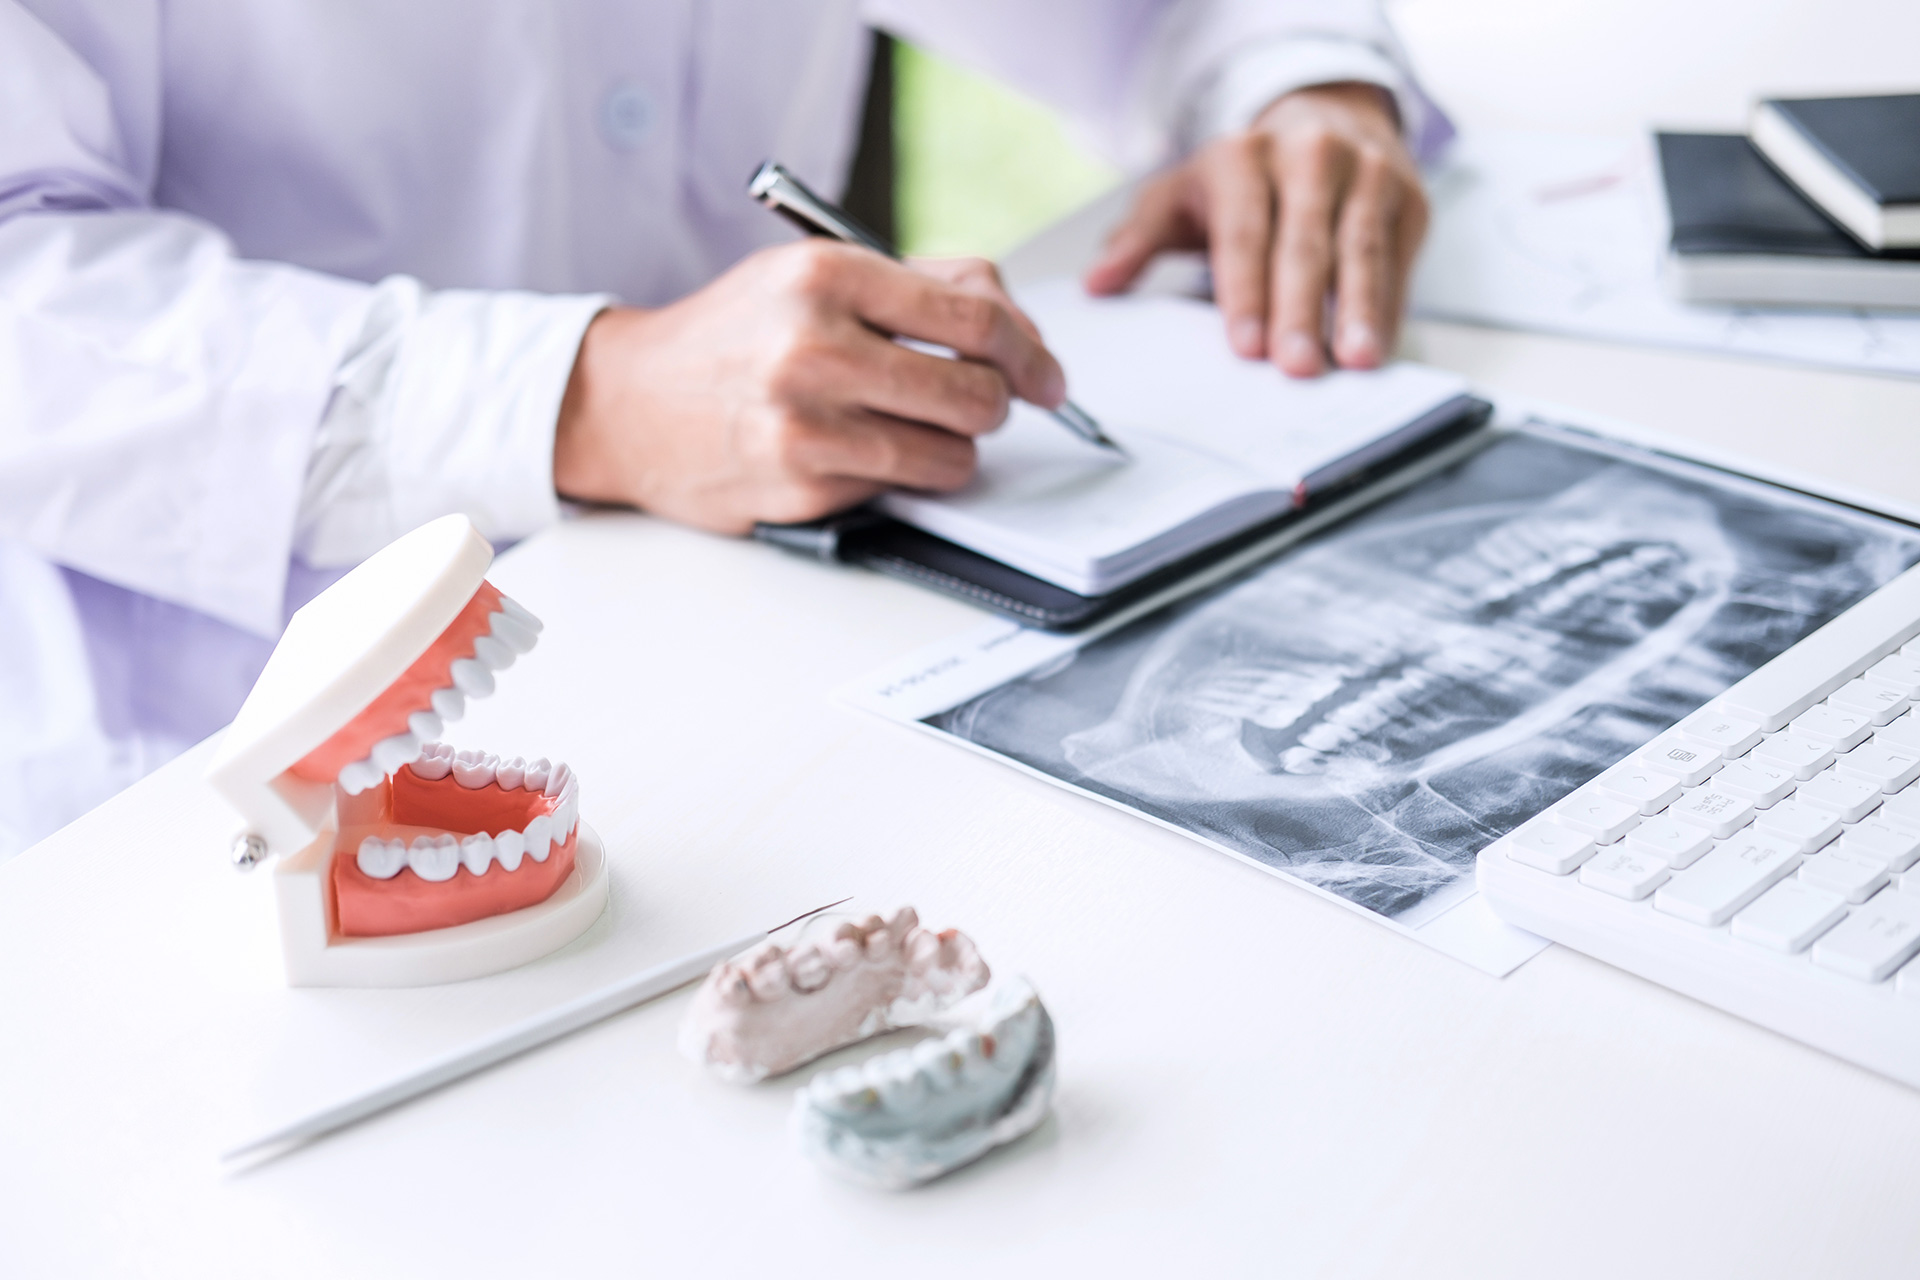 kanata implants carleton place bone grafts surgery